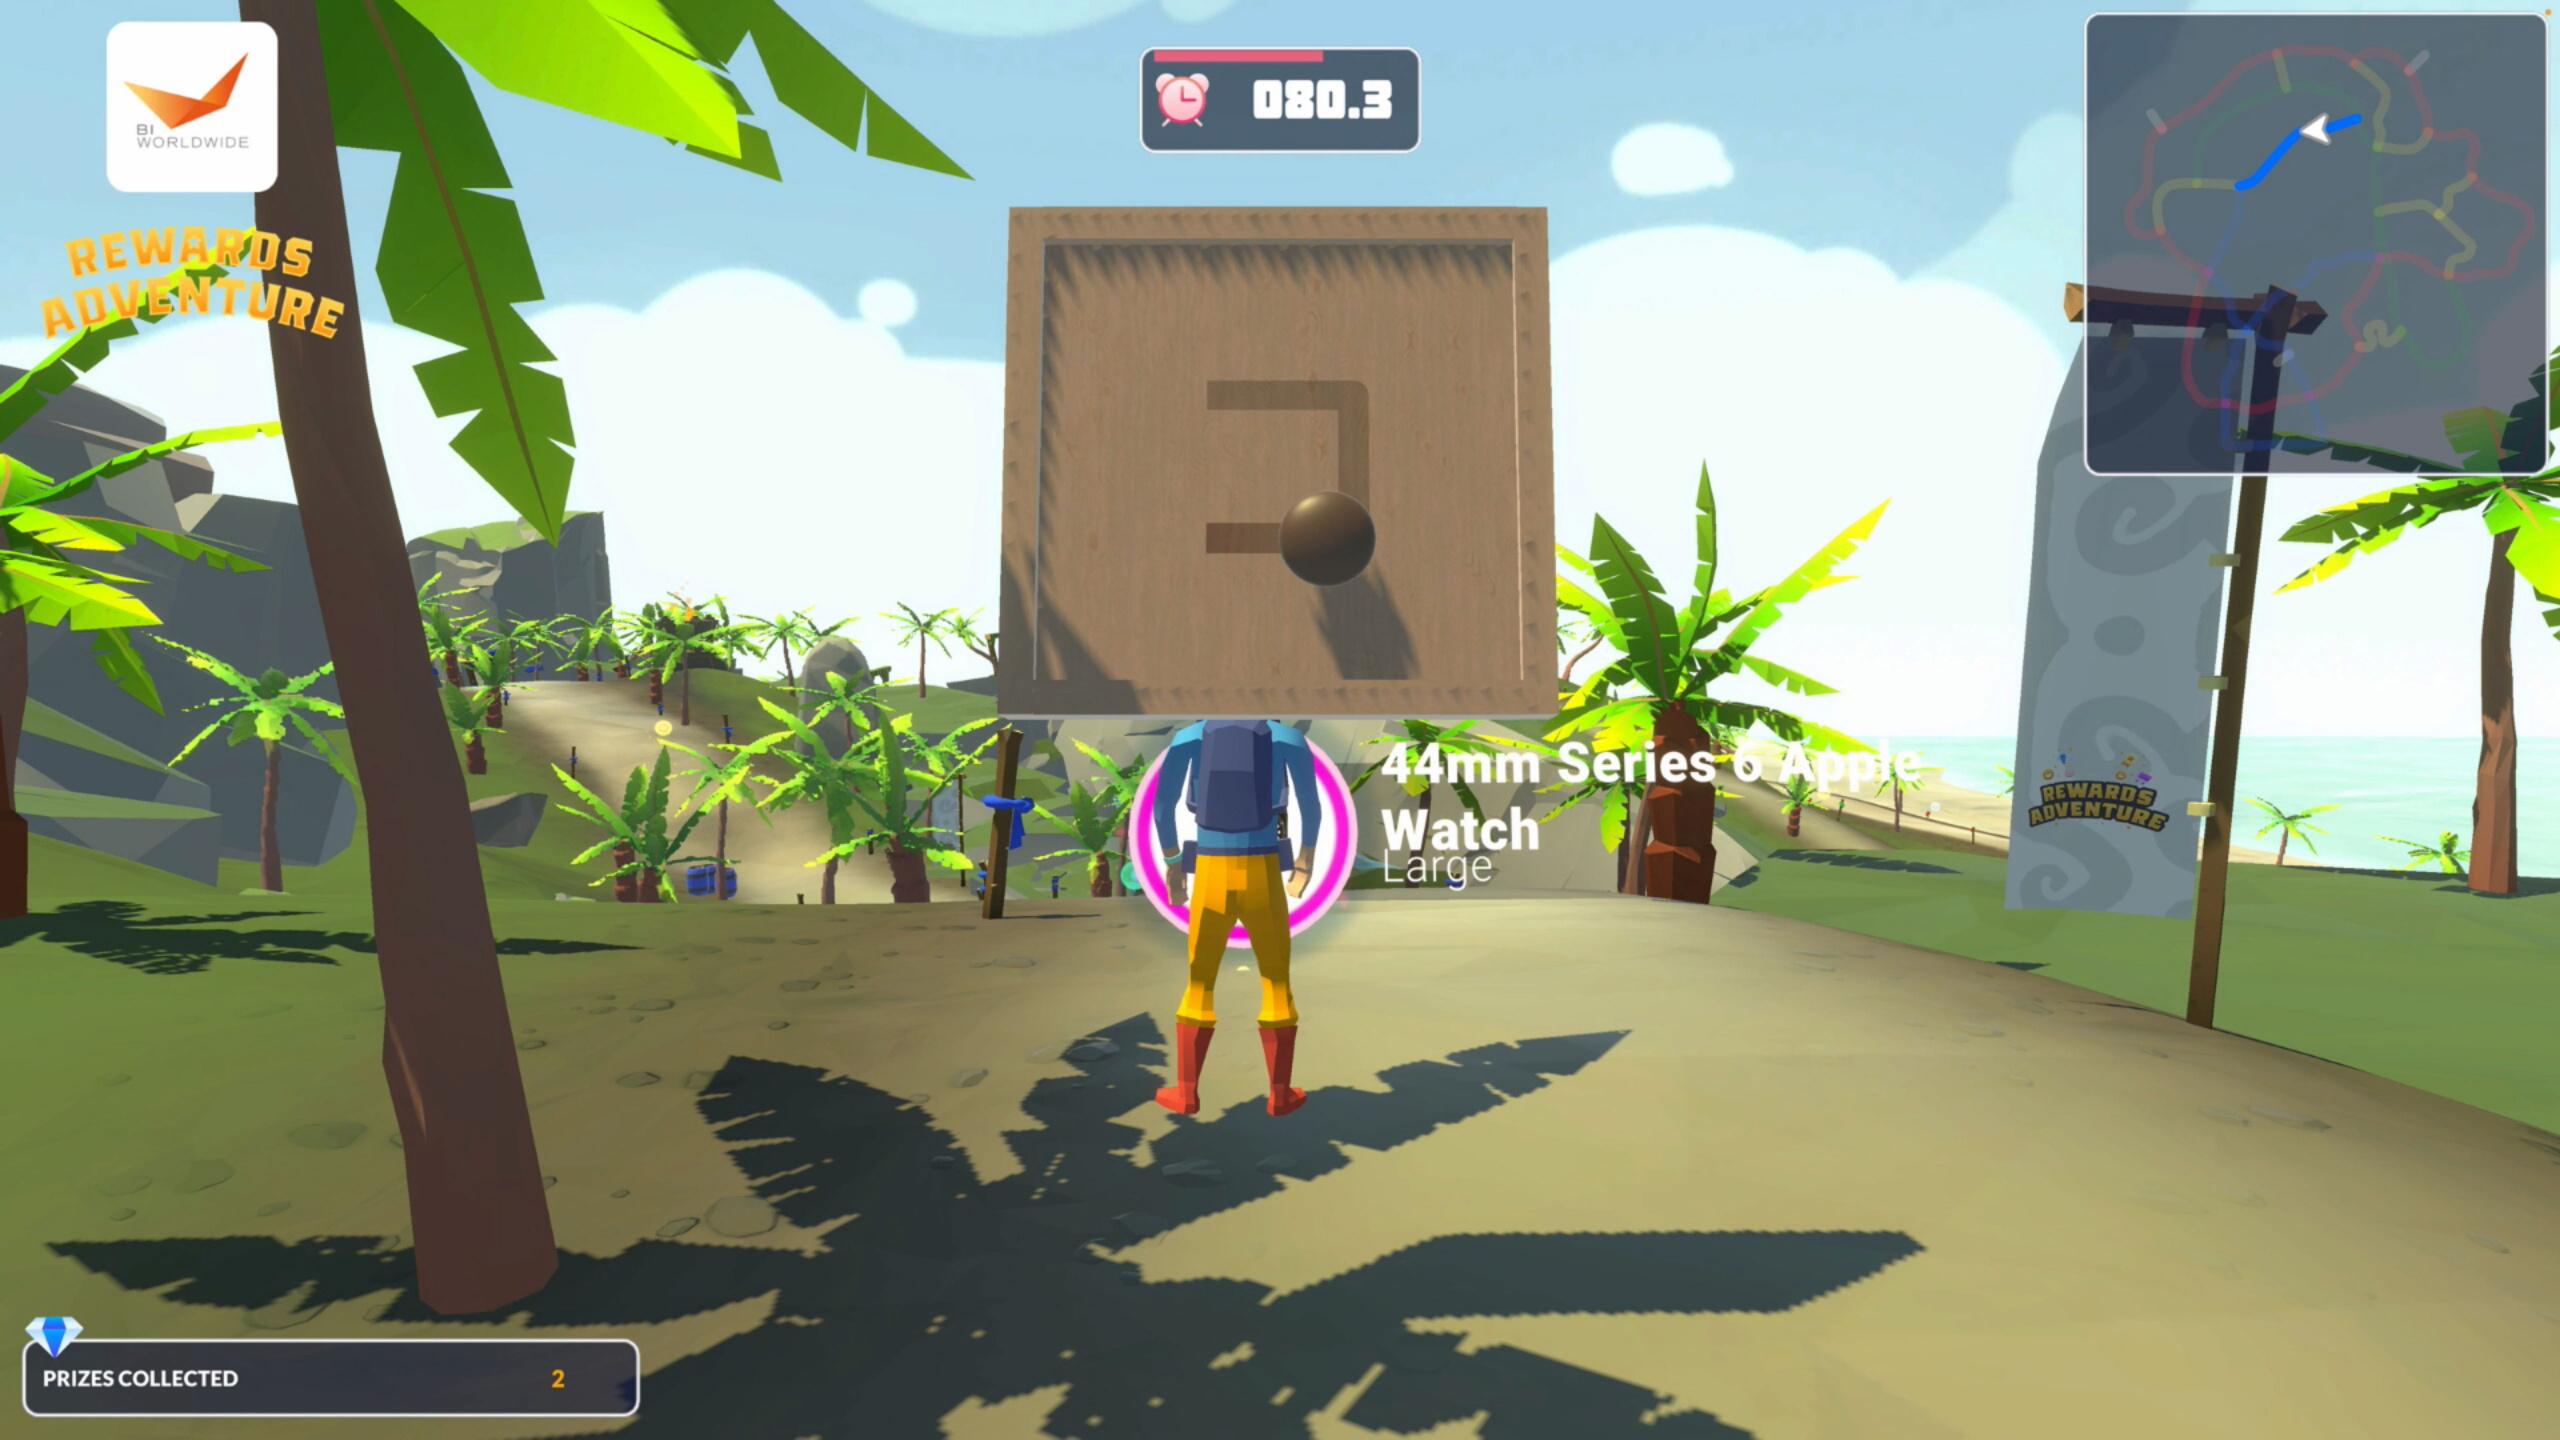 web gl game